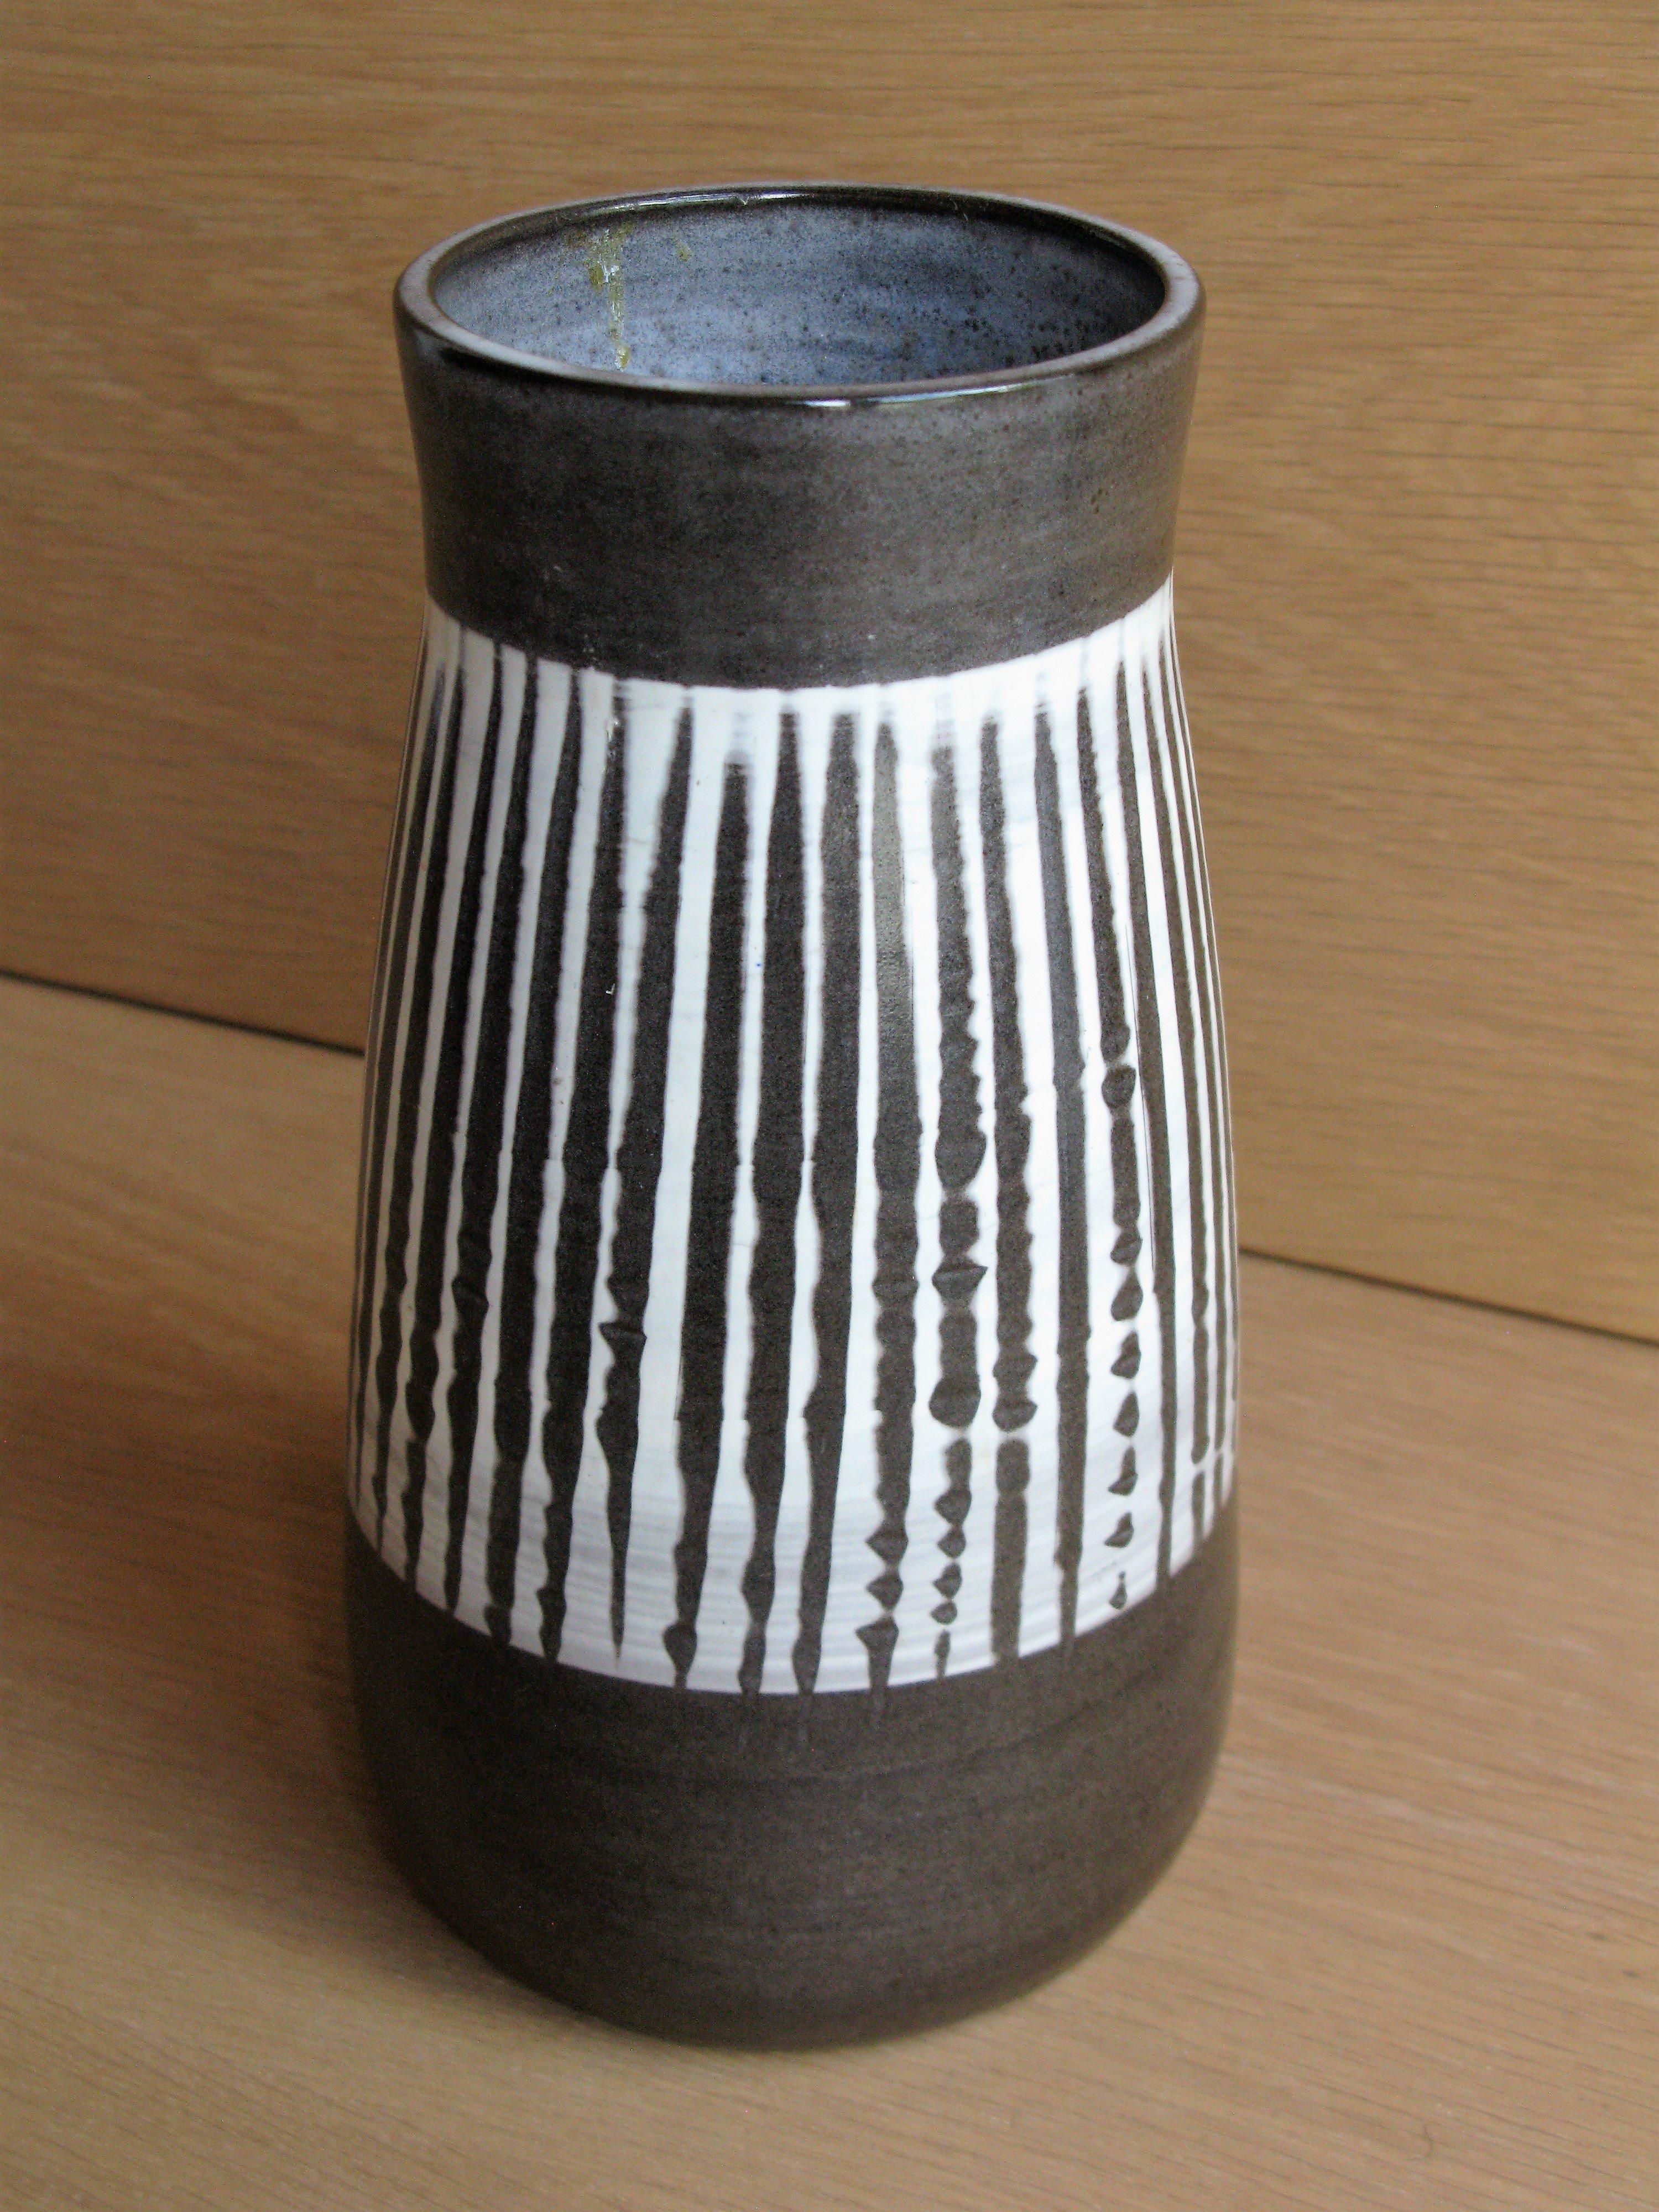 sippa vase 4554